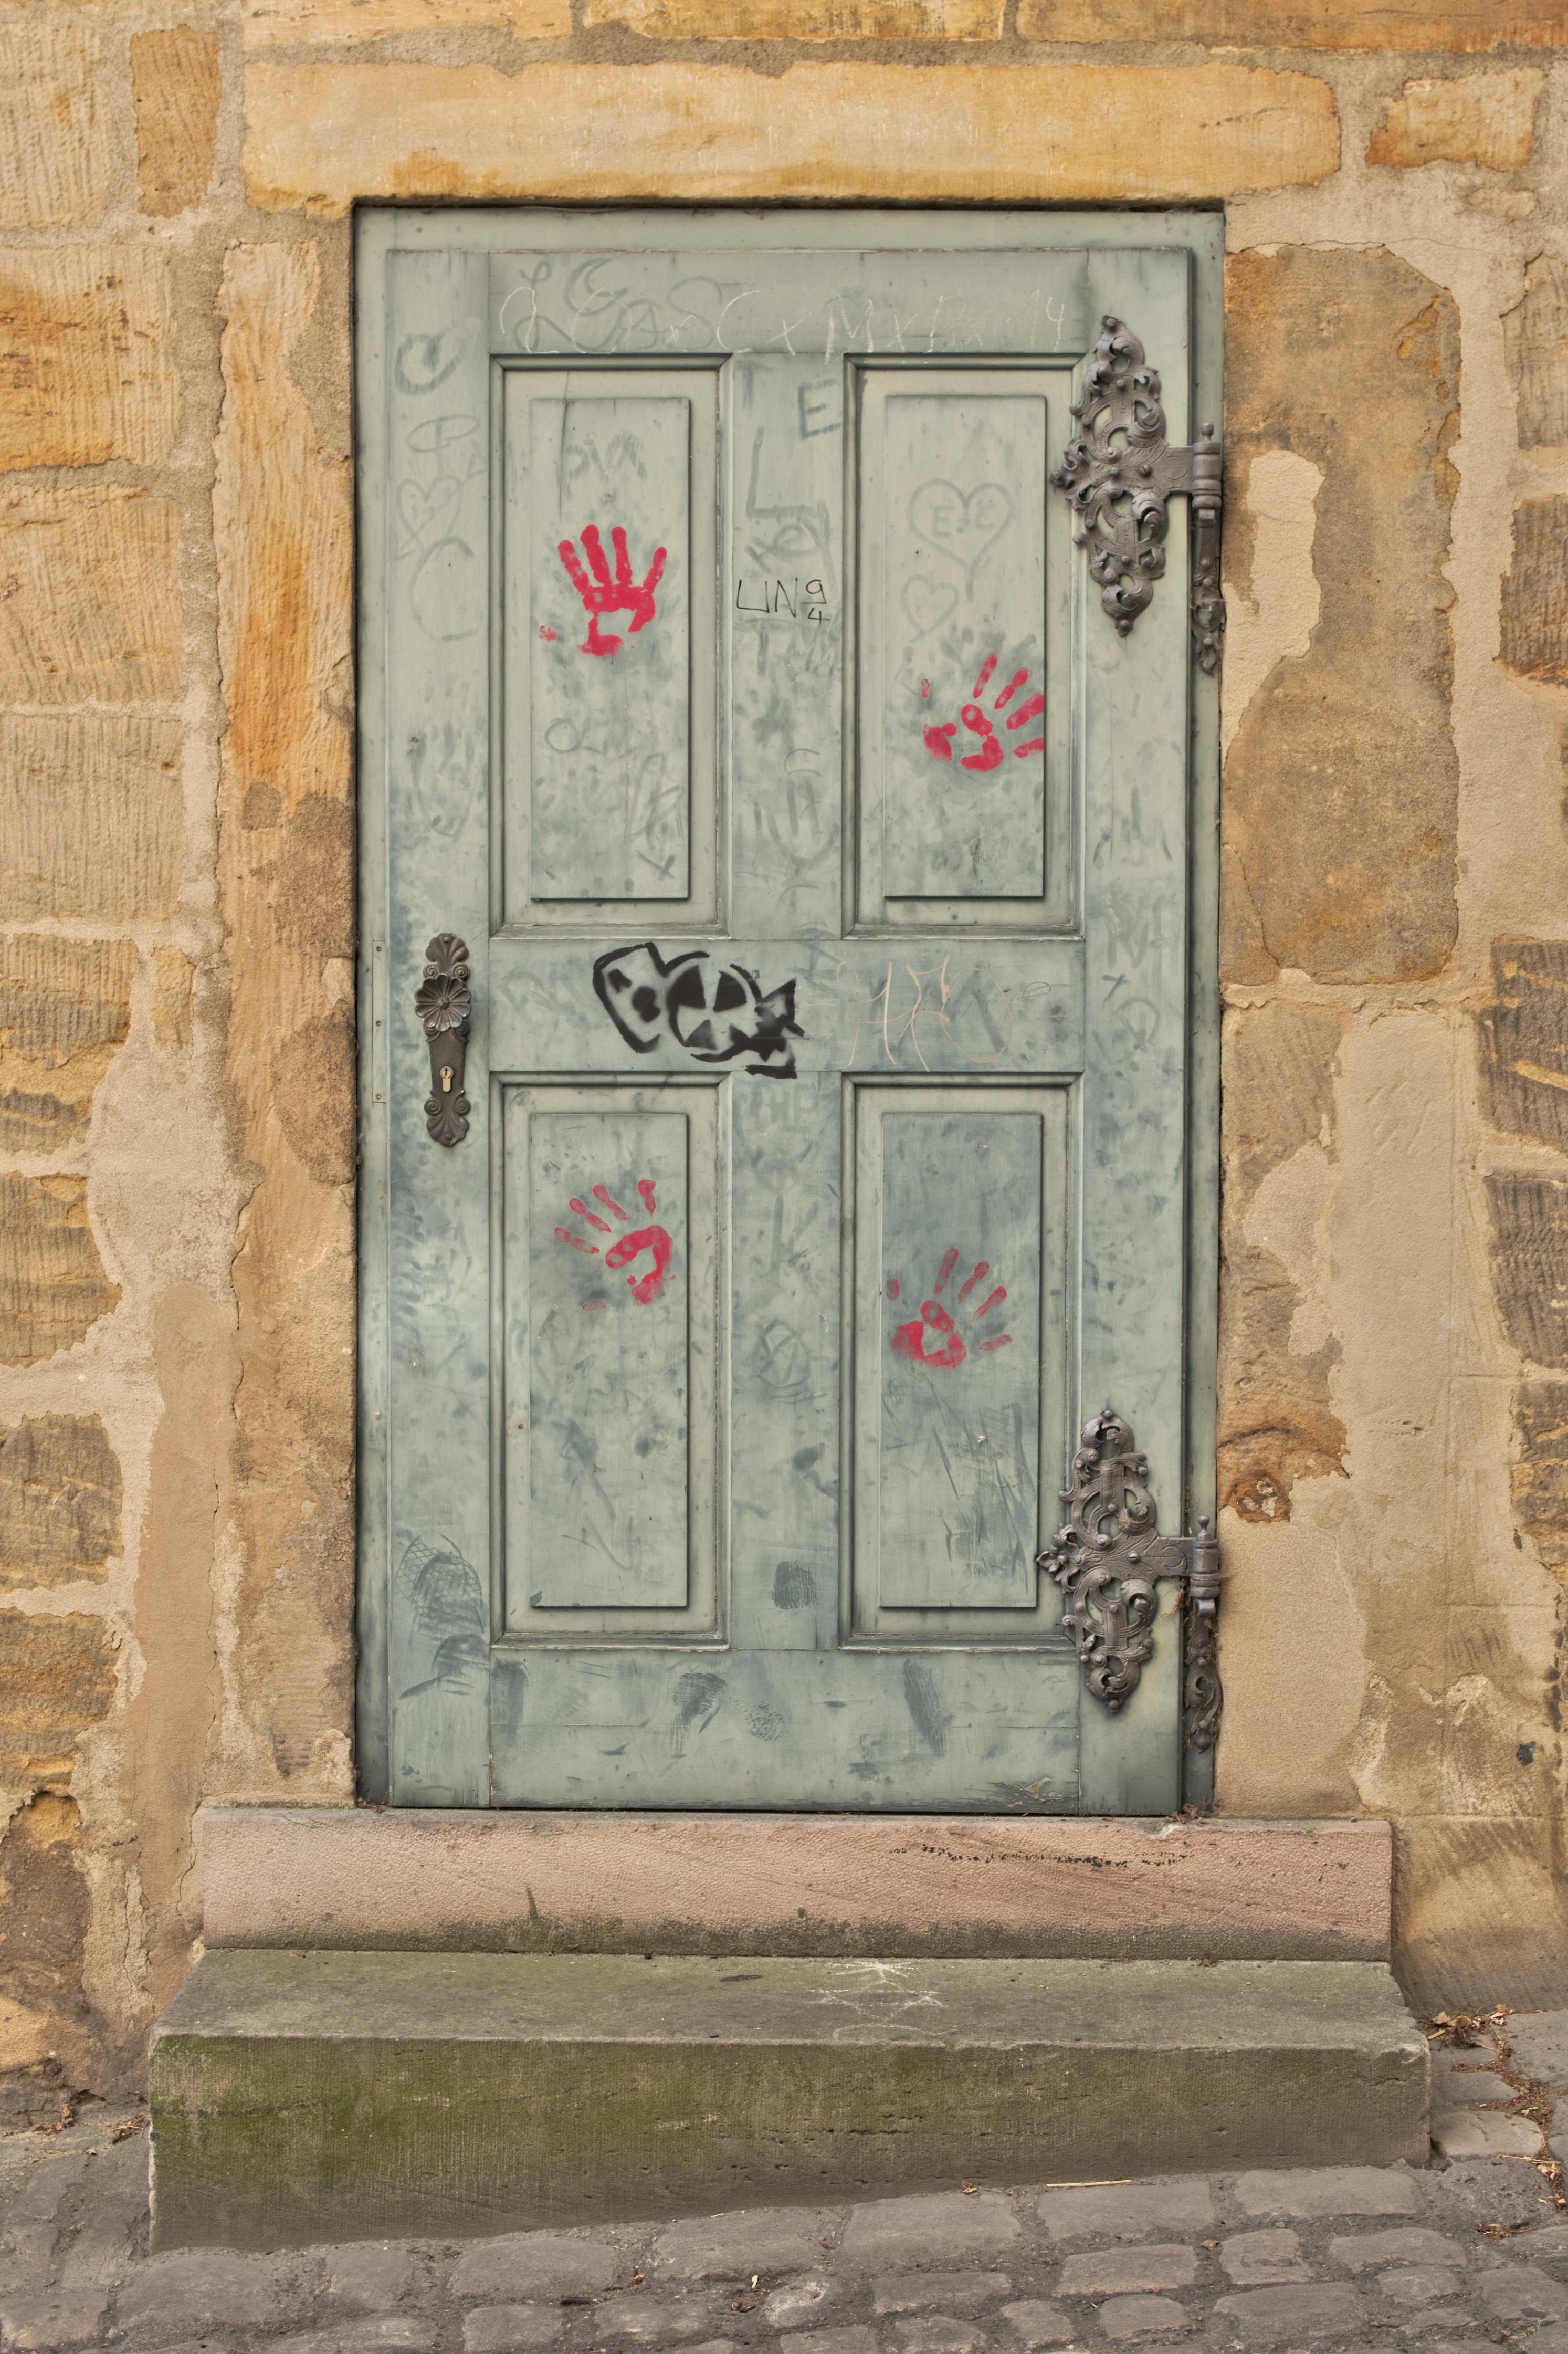 FileOld door in Bamberg (color version).jpg & File:Old door in Bamberg (color version).jpg - Wikimedia Commons